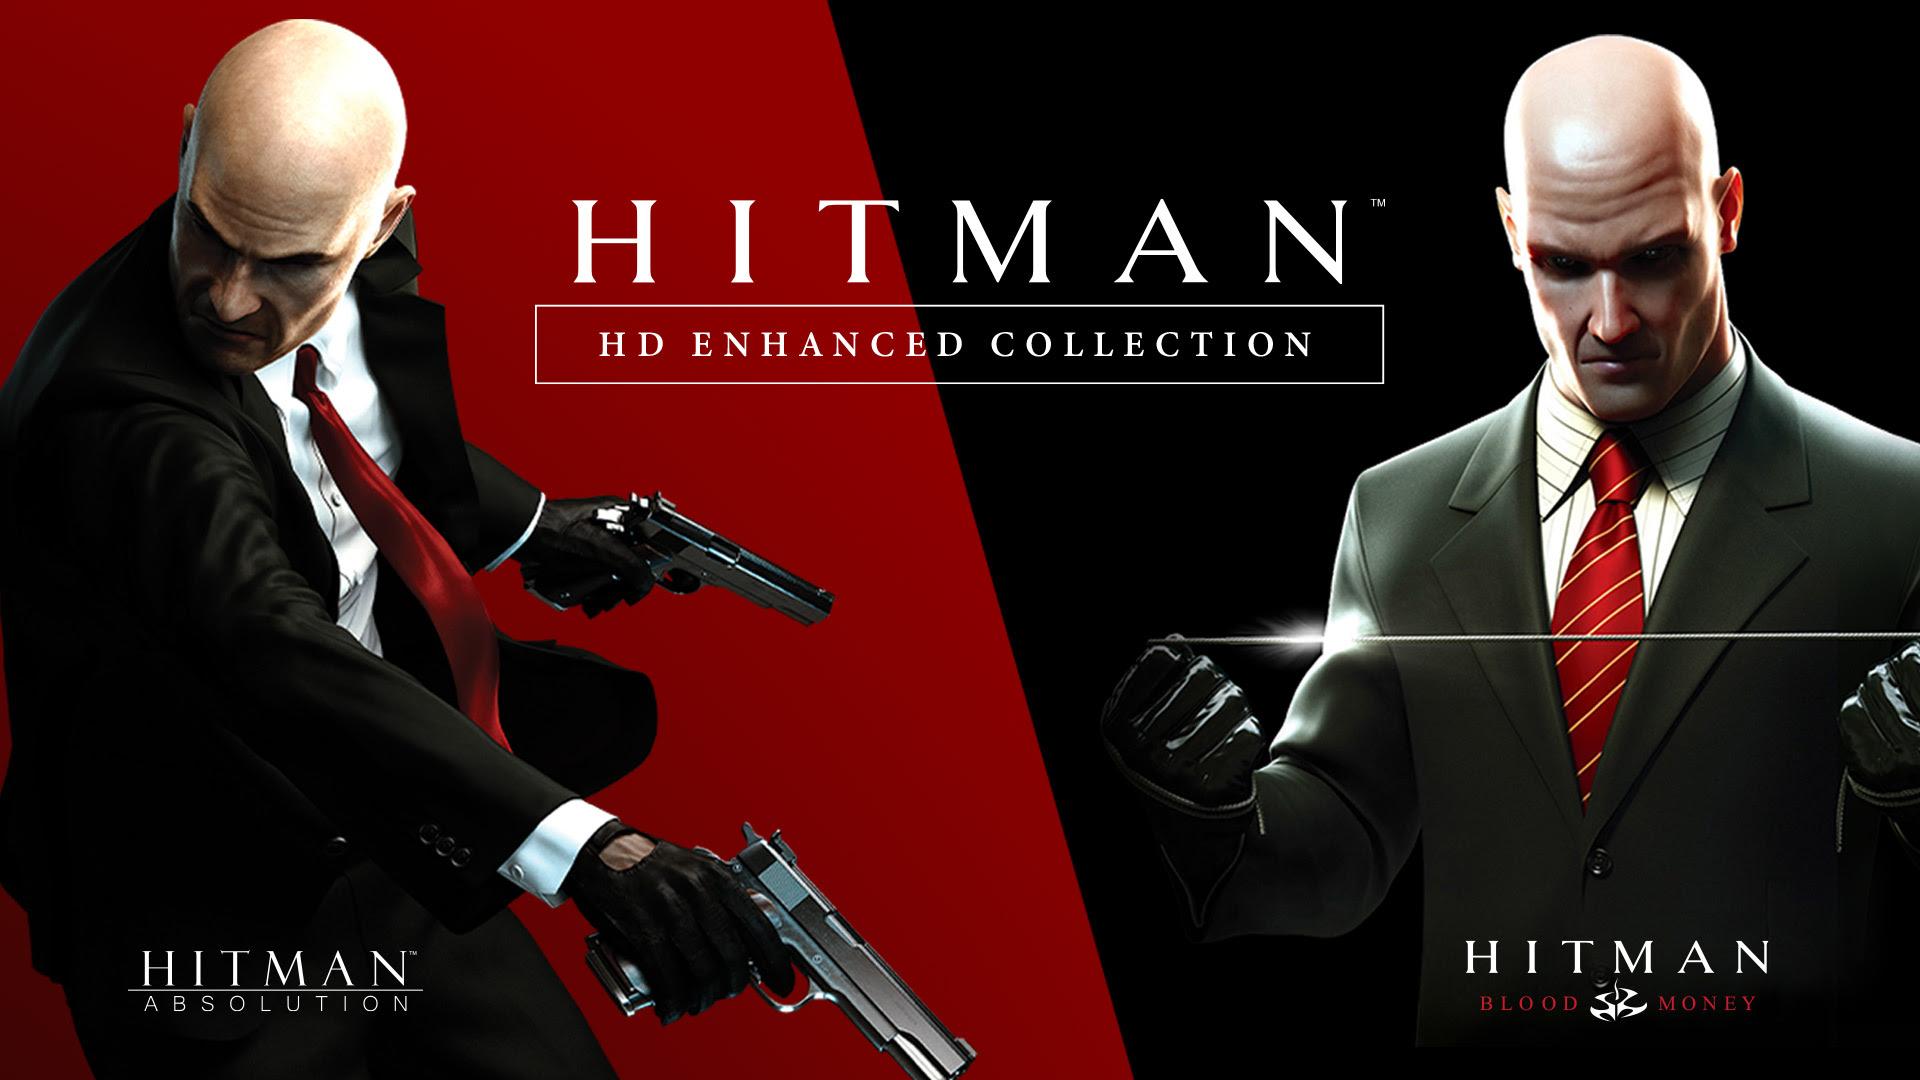 Warner Bros. annuncia ufficialmente Hitman HD Enhanced Collection